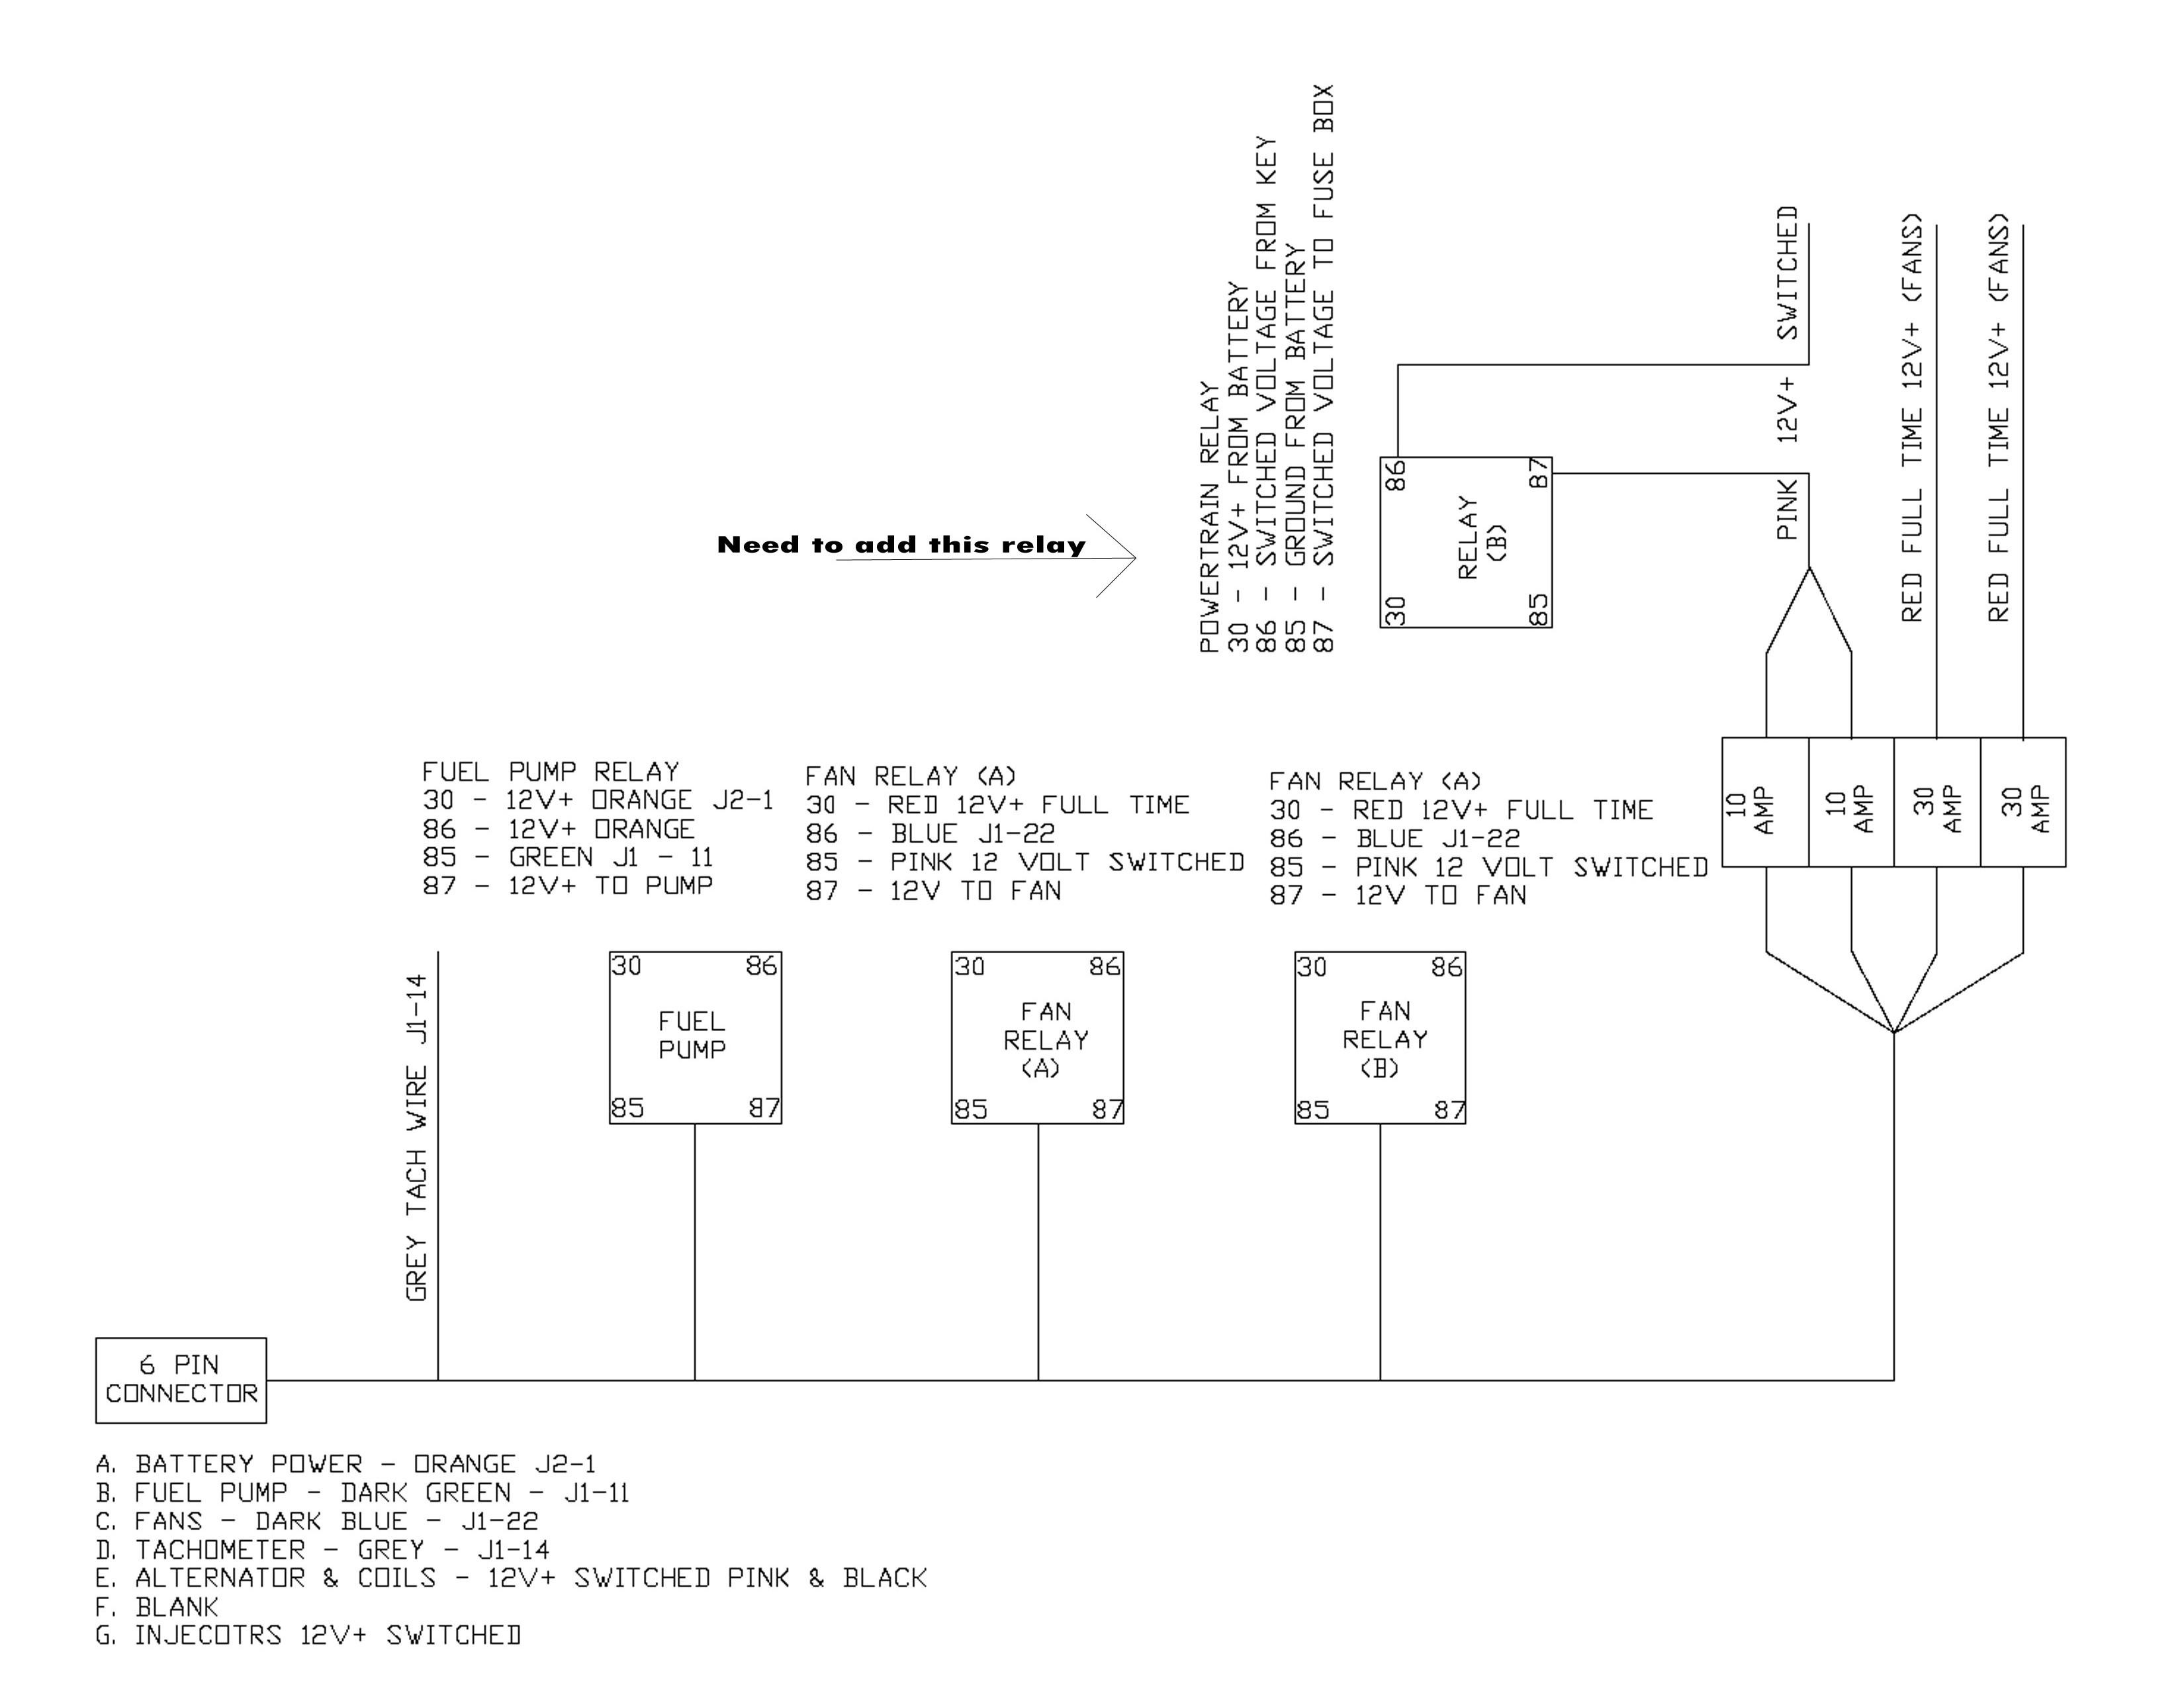 mefi 4 wiring harness diagram ls1 wiring diagram LS1 Wiring Schematic mefi 4 wiring harness diagram ls1 wiring diagrammefi 4 wiring diagramtechnical information painless 65104 mefi 4